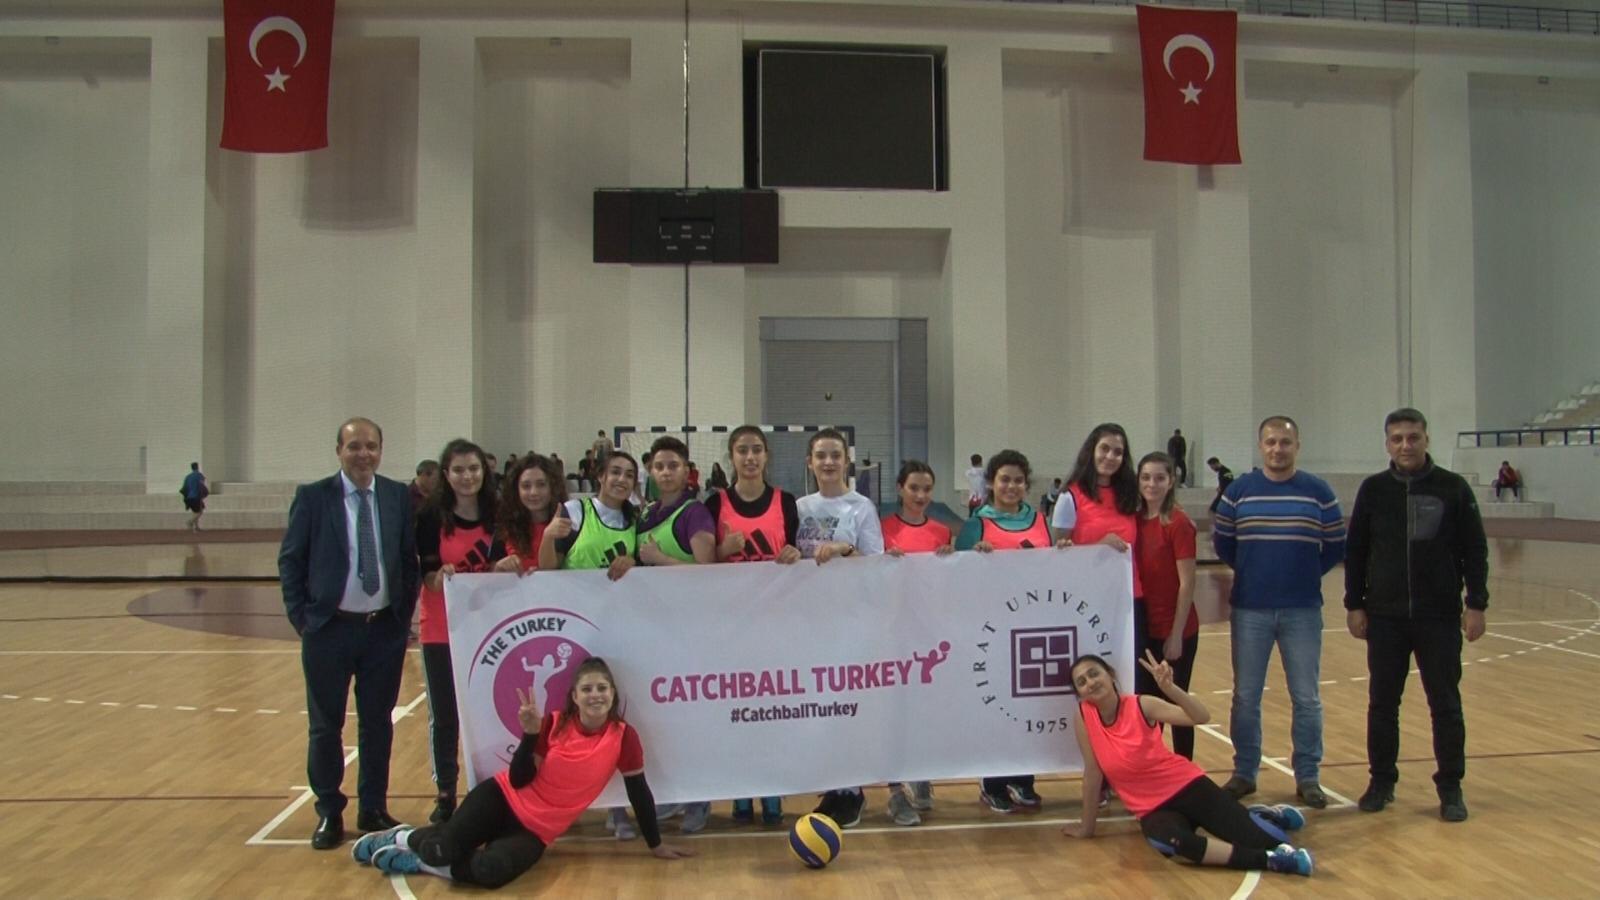 Catchball Turkey